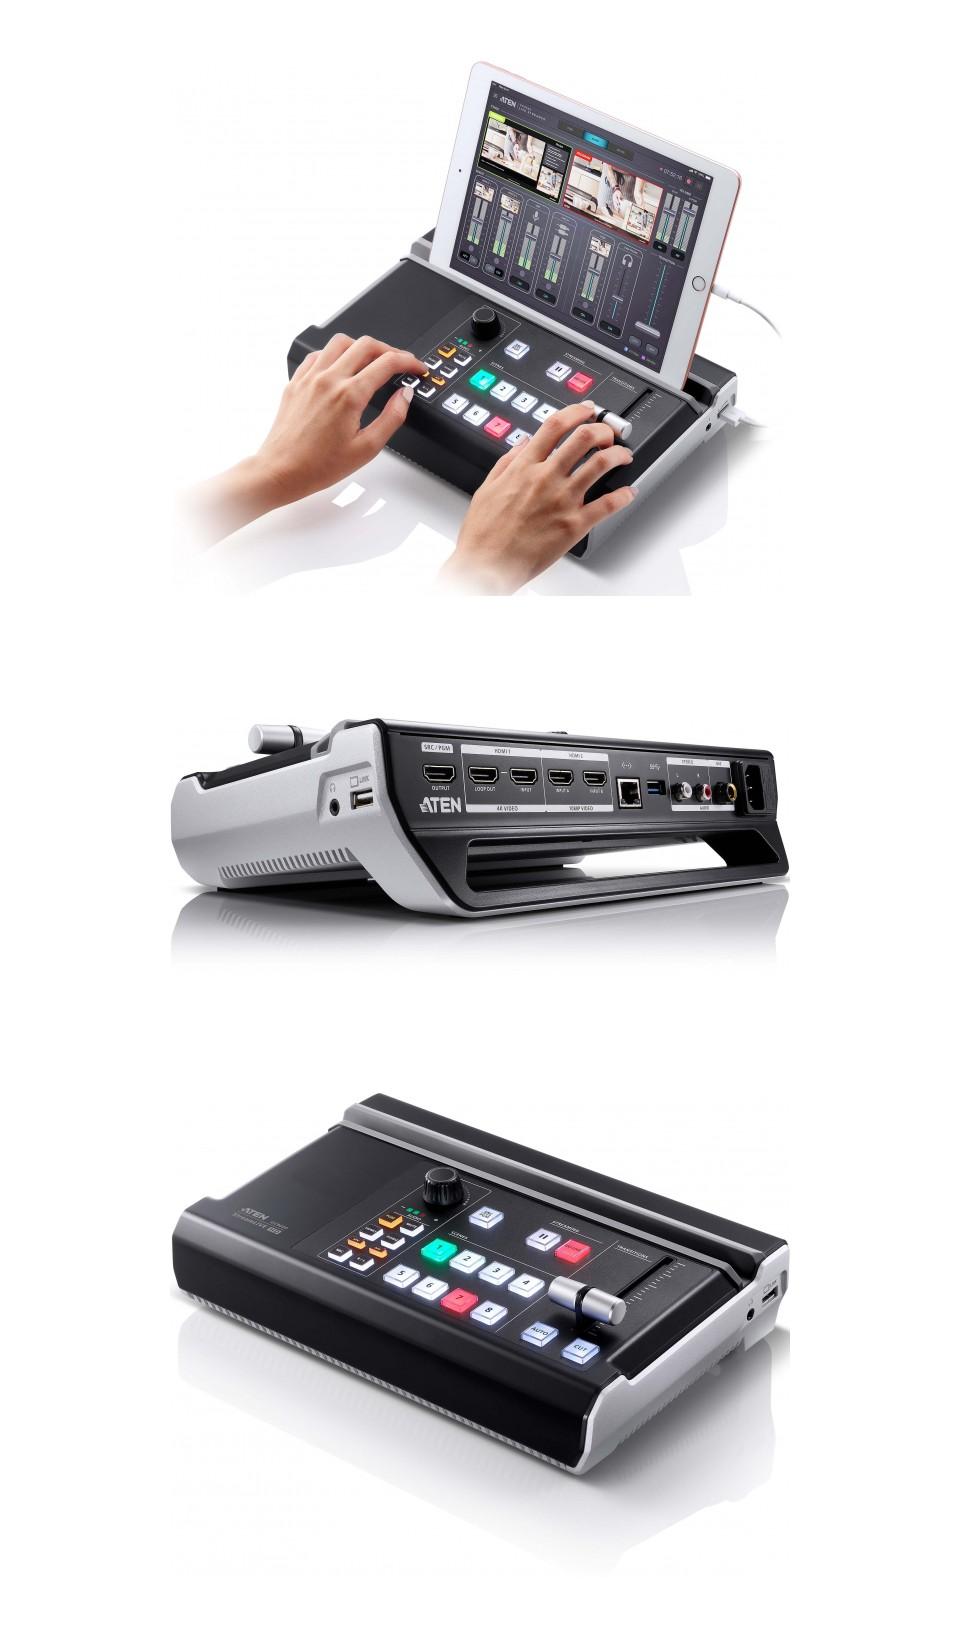 ATEN UC9020 StreamLive HD All-In-One Multi-channel AV Mixer product